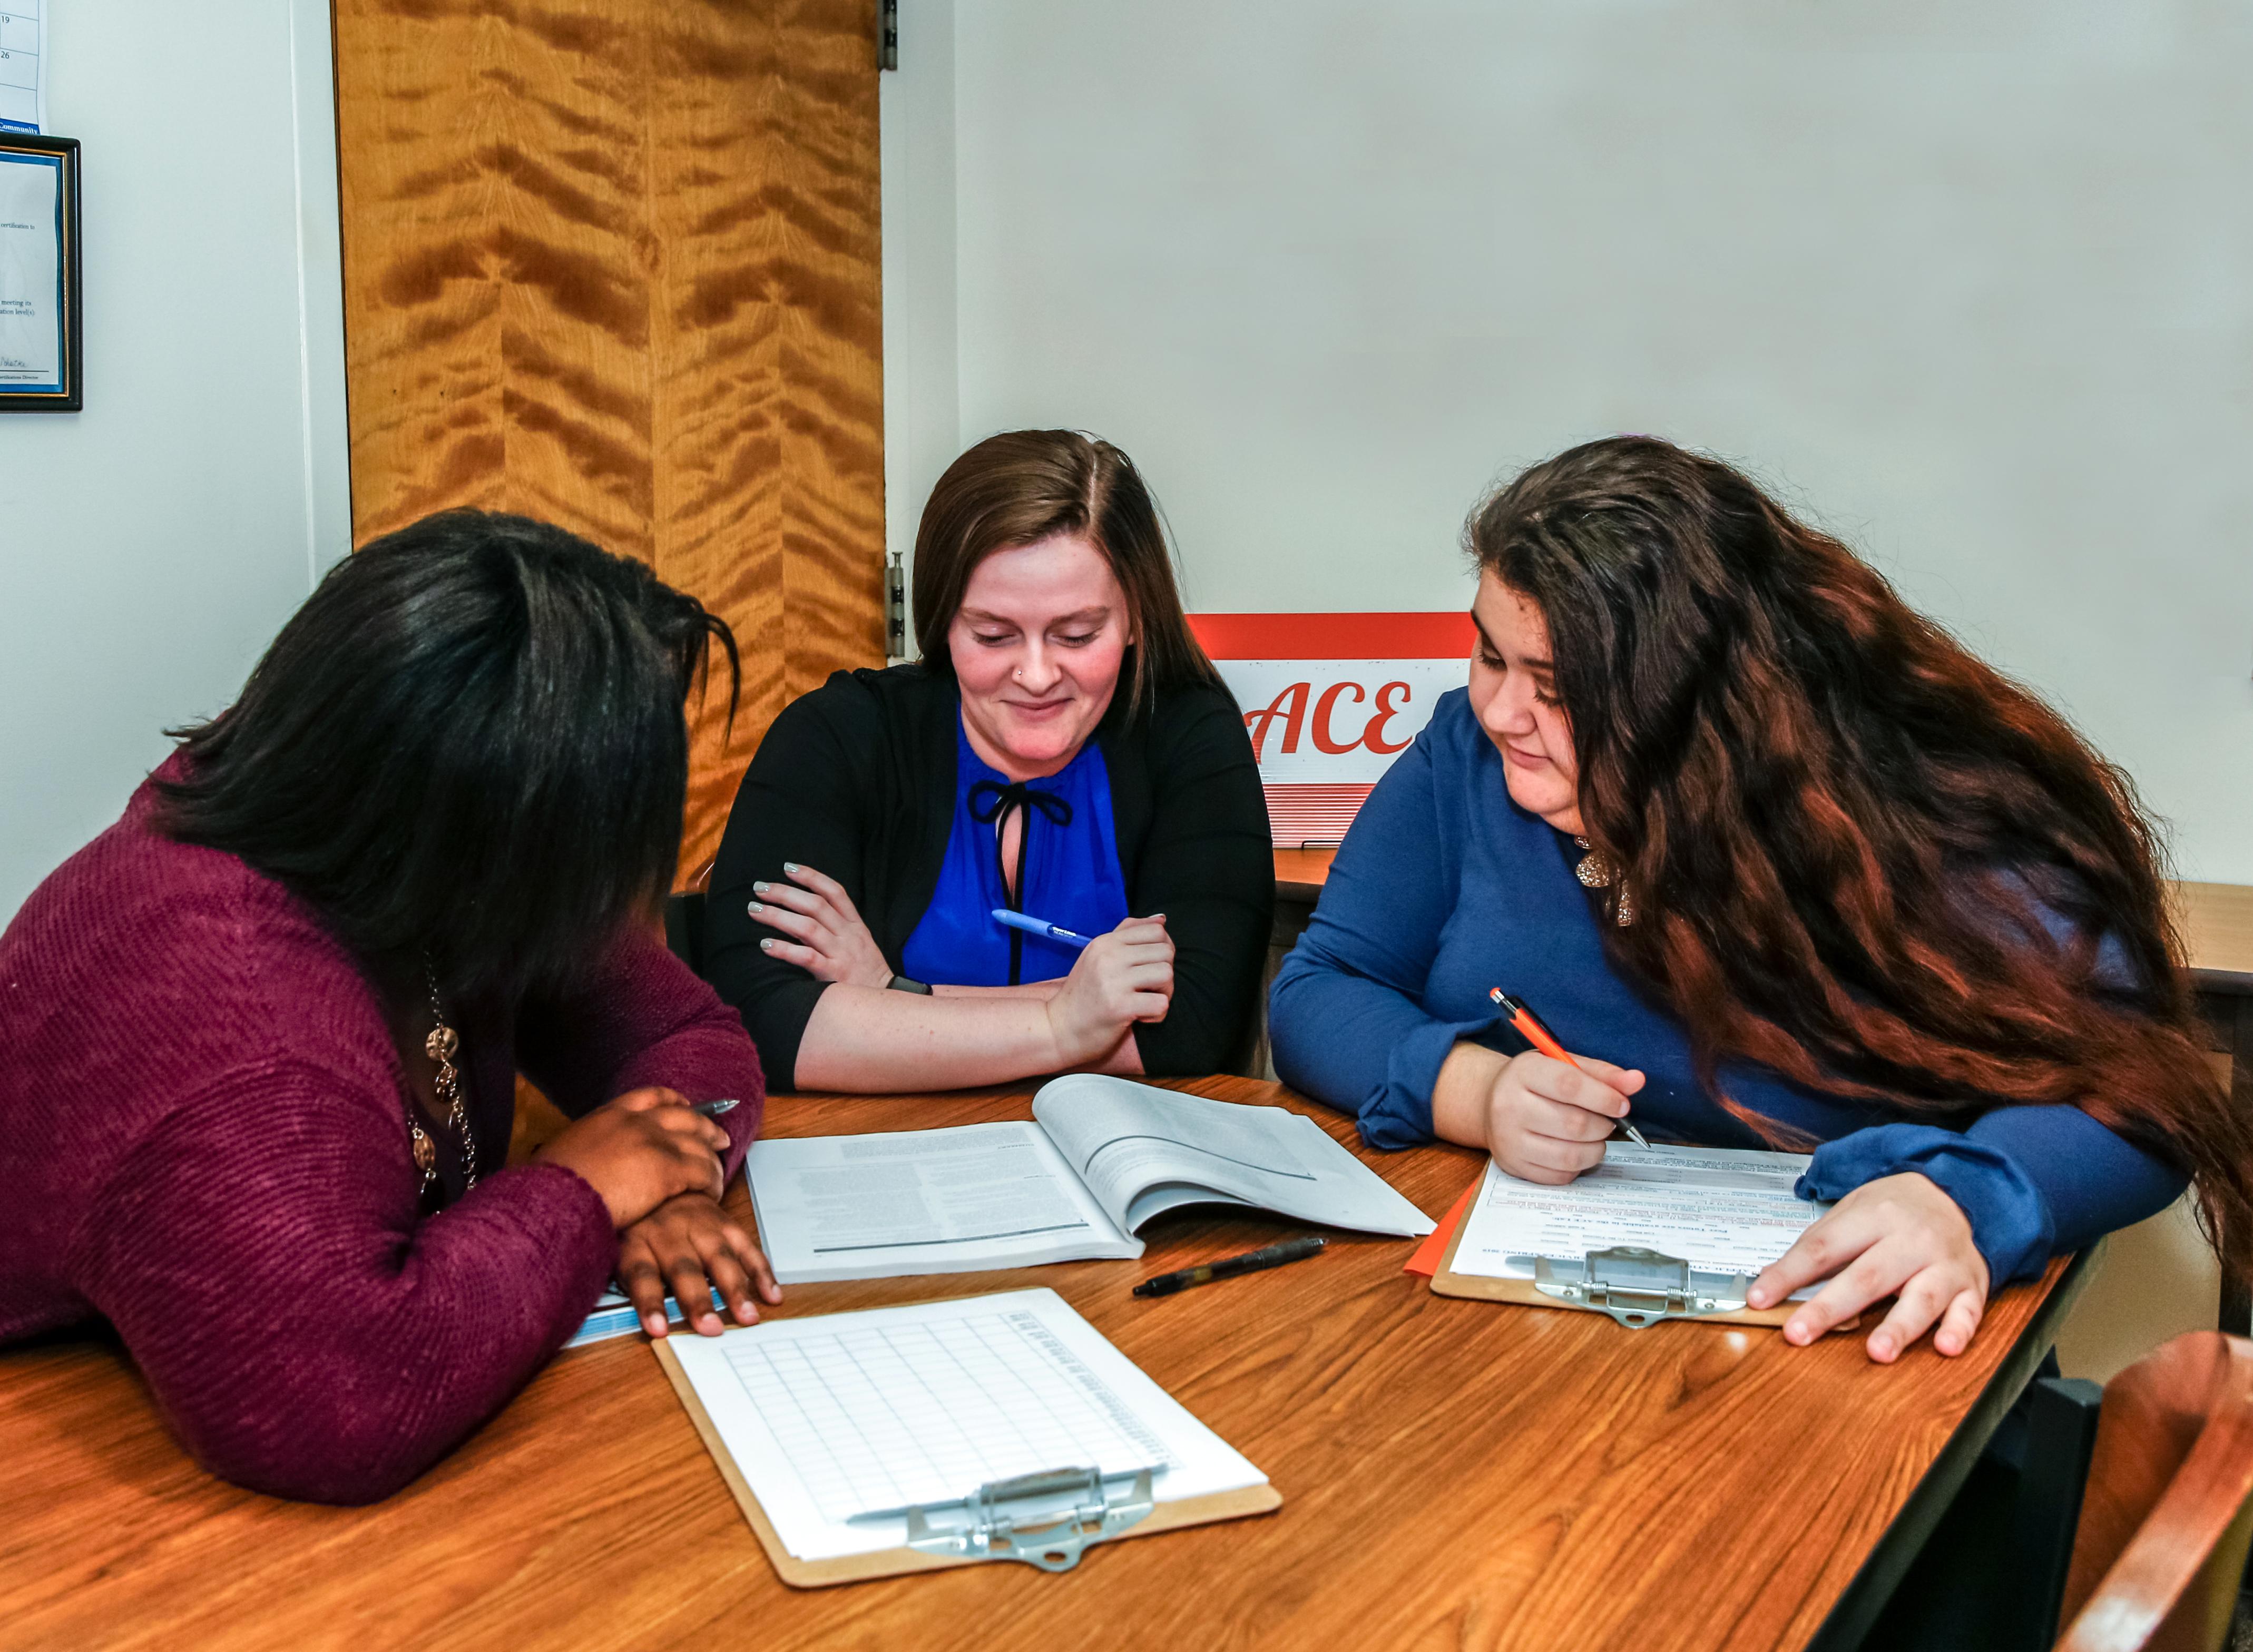 UPIKE ACE Program receives national certification   UPIKE